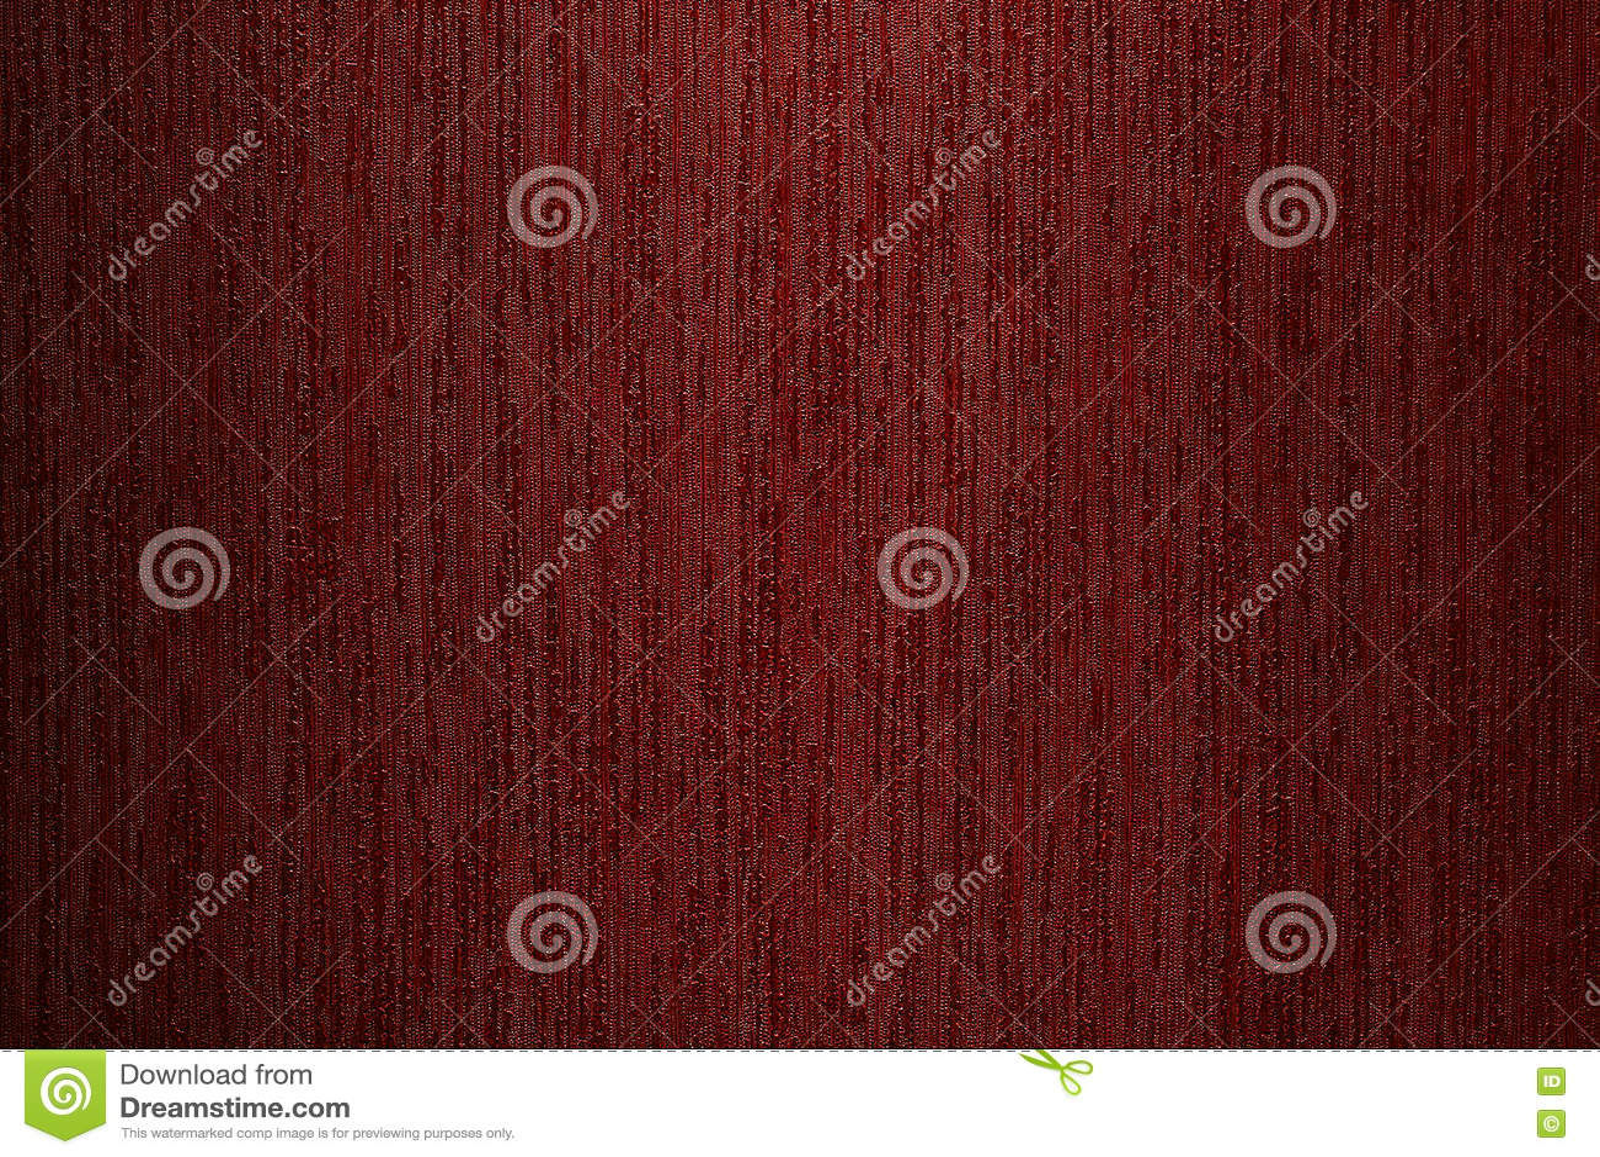 Popular Wallpaper Marble Burgundy - burgundy-red-textured-wallpaper-background-vertical-striped-76899354  Best Photo Reference_95238.jpg